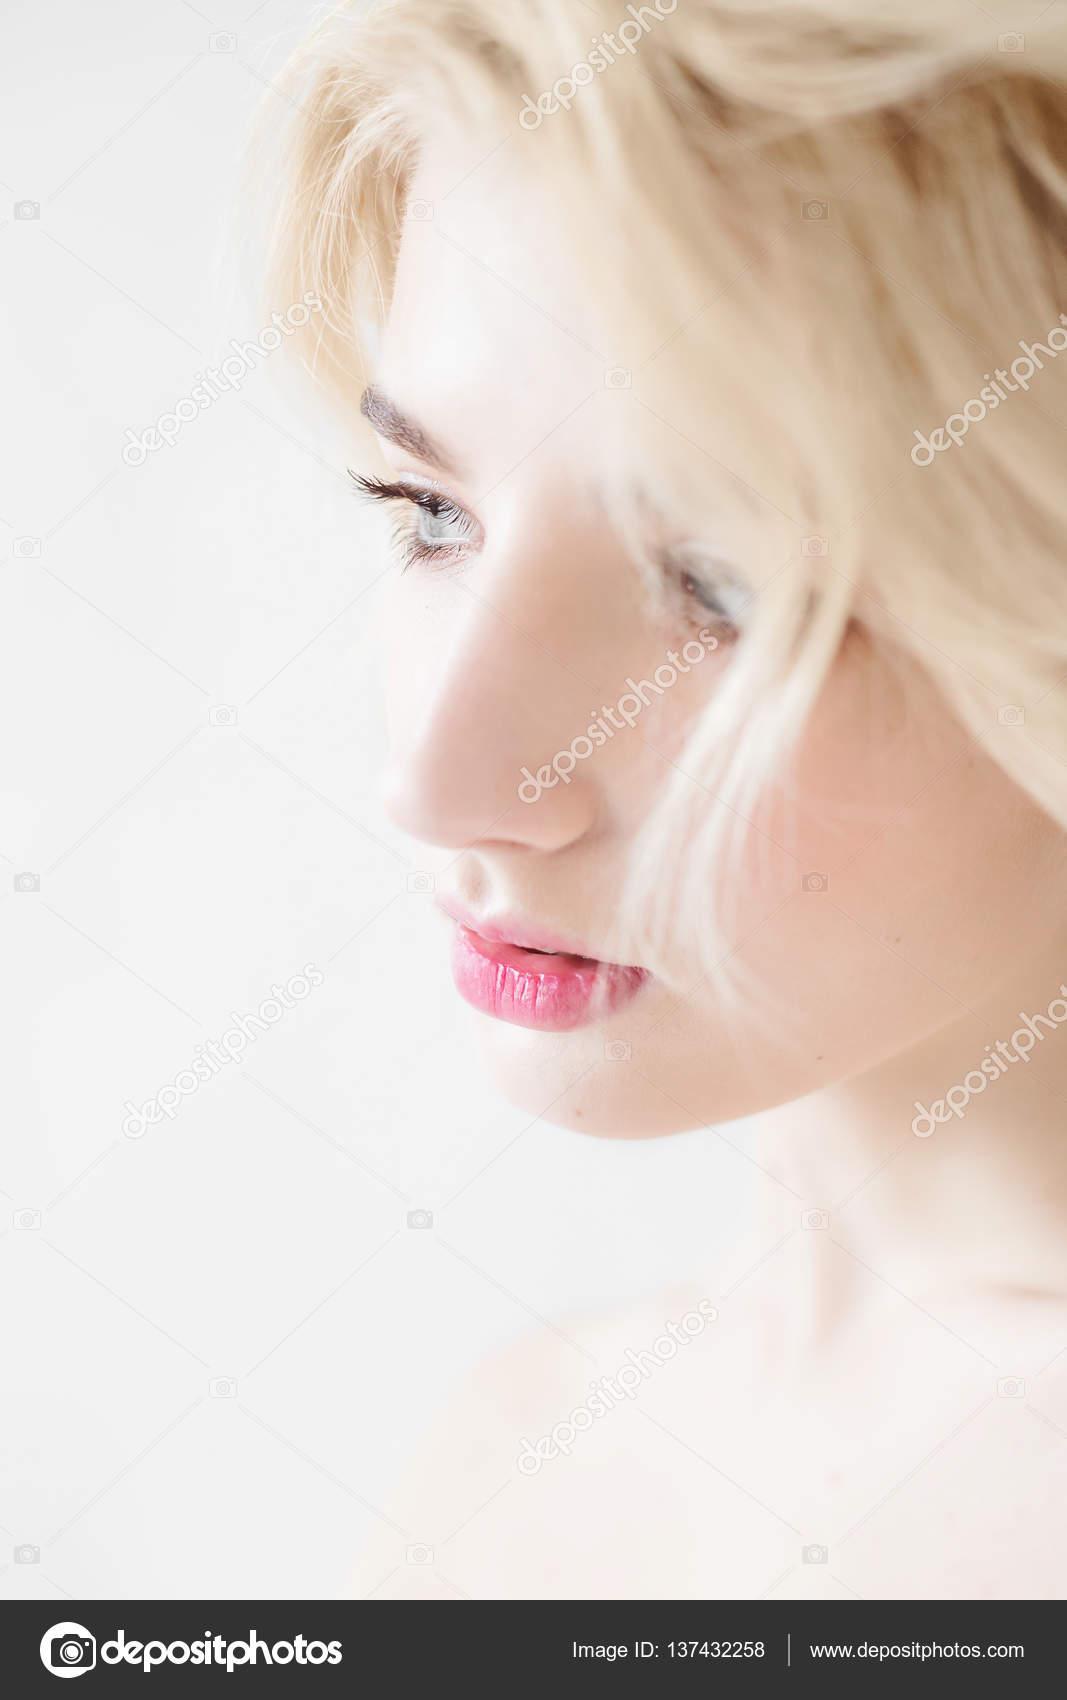 salma hayek nude scene pics